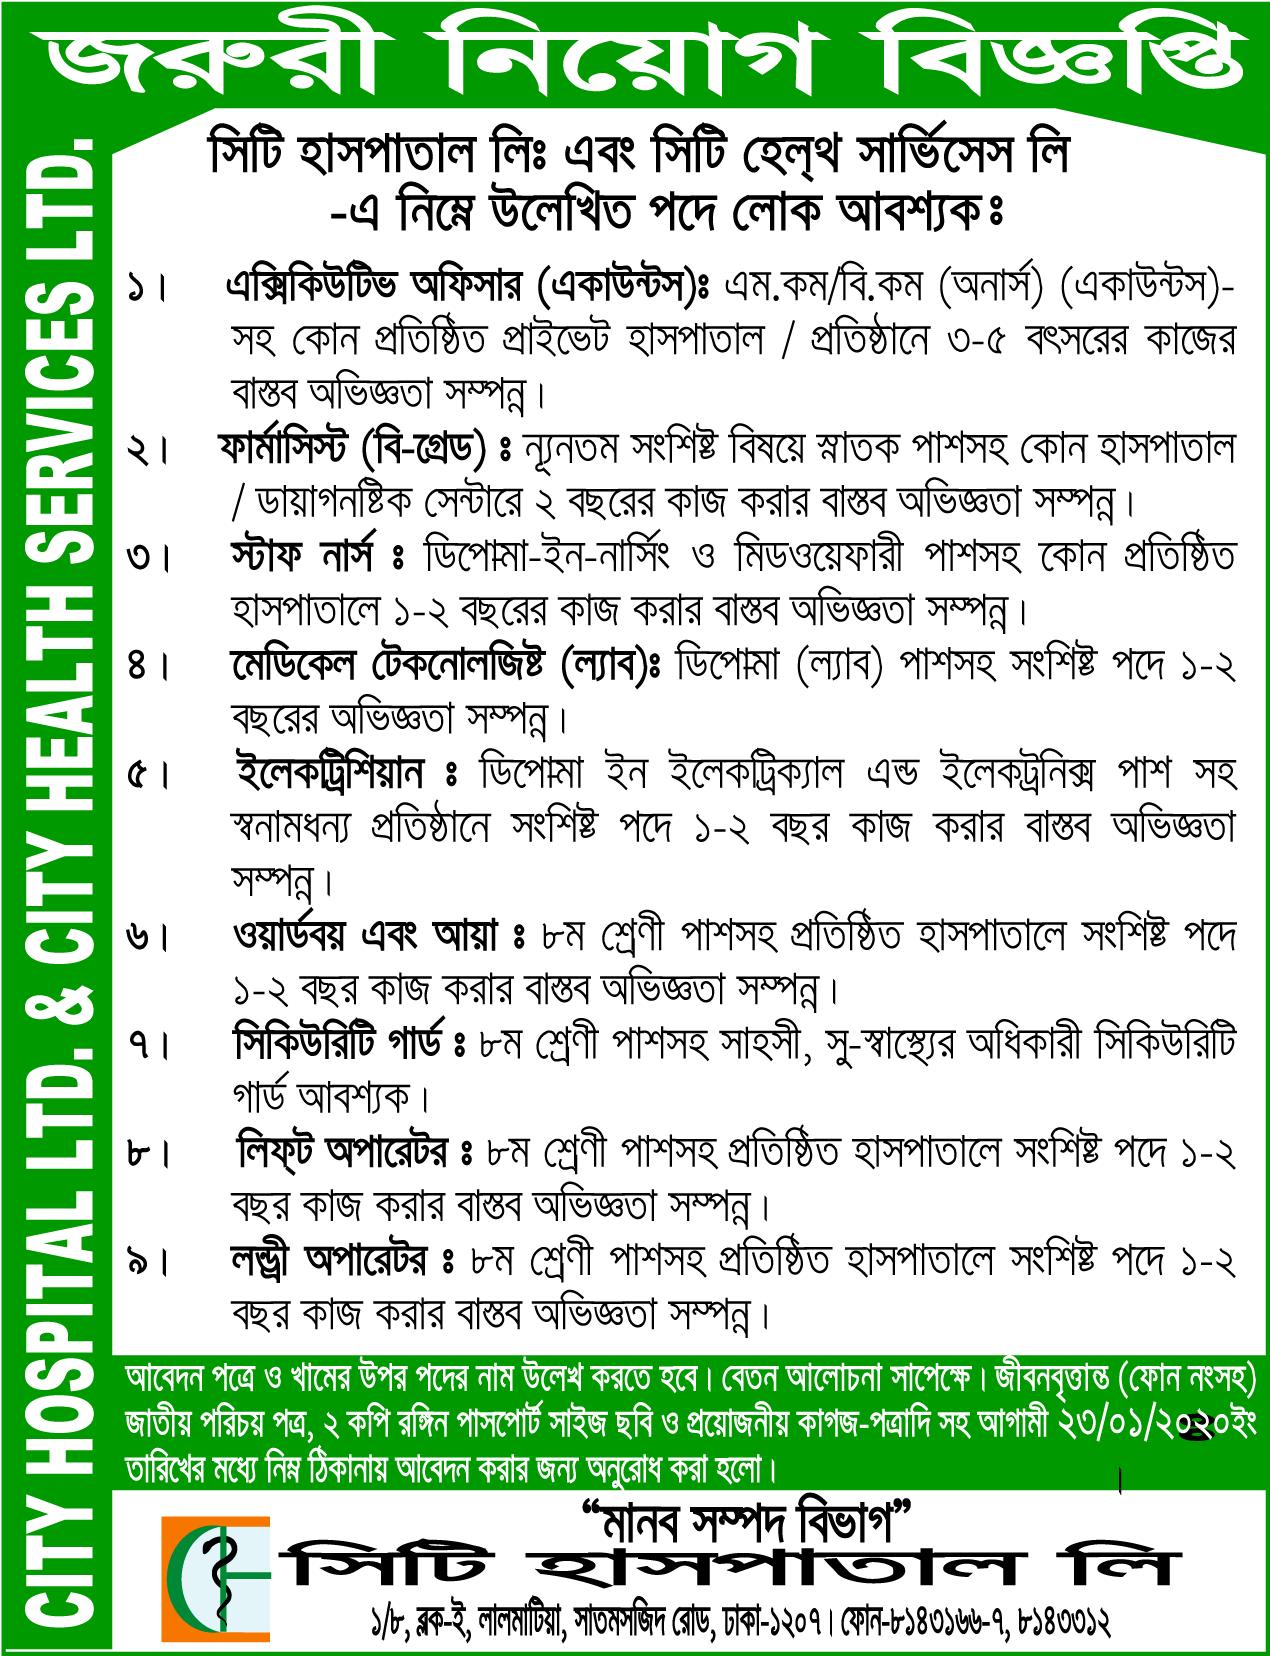 City Hospital Urgent Recruitment Notice